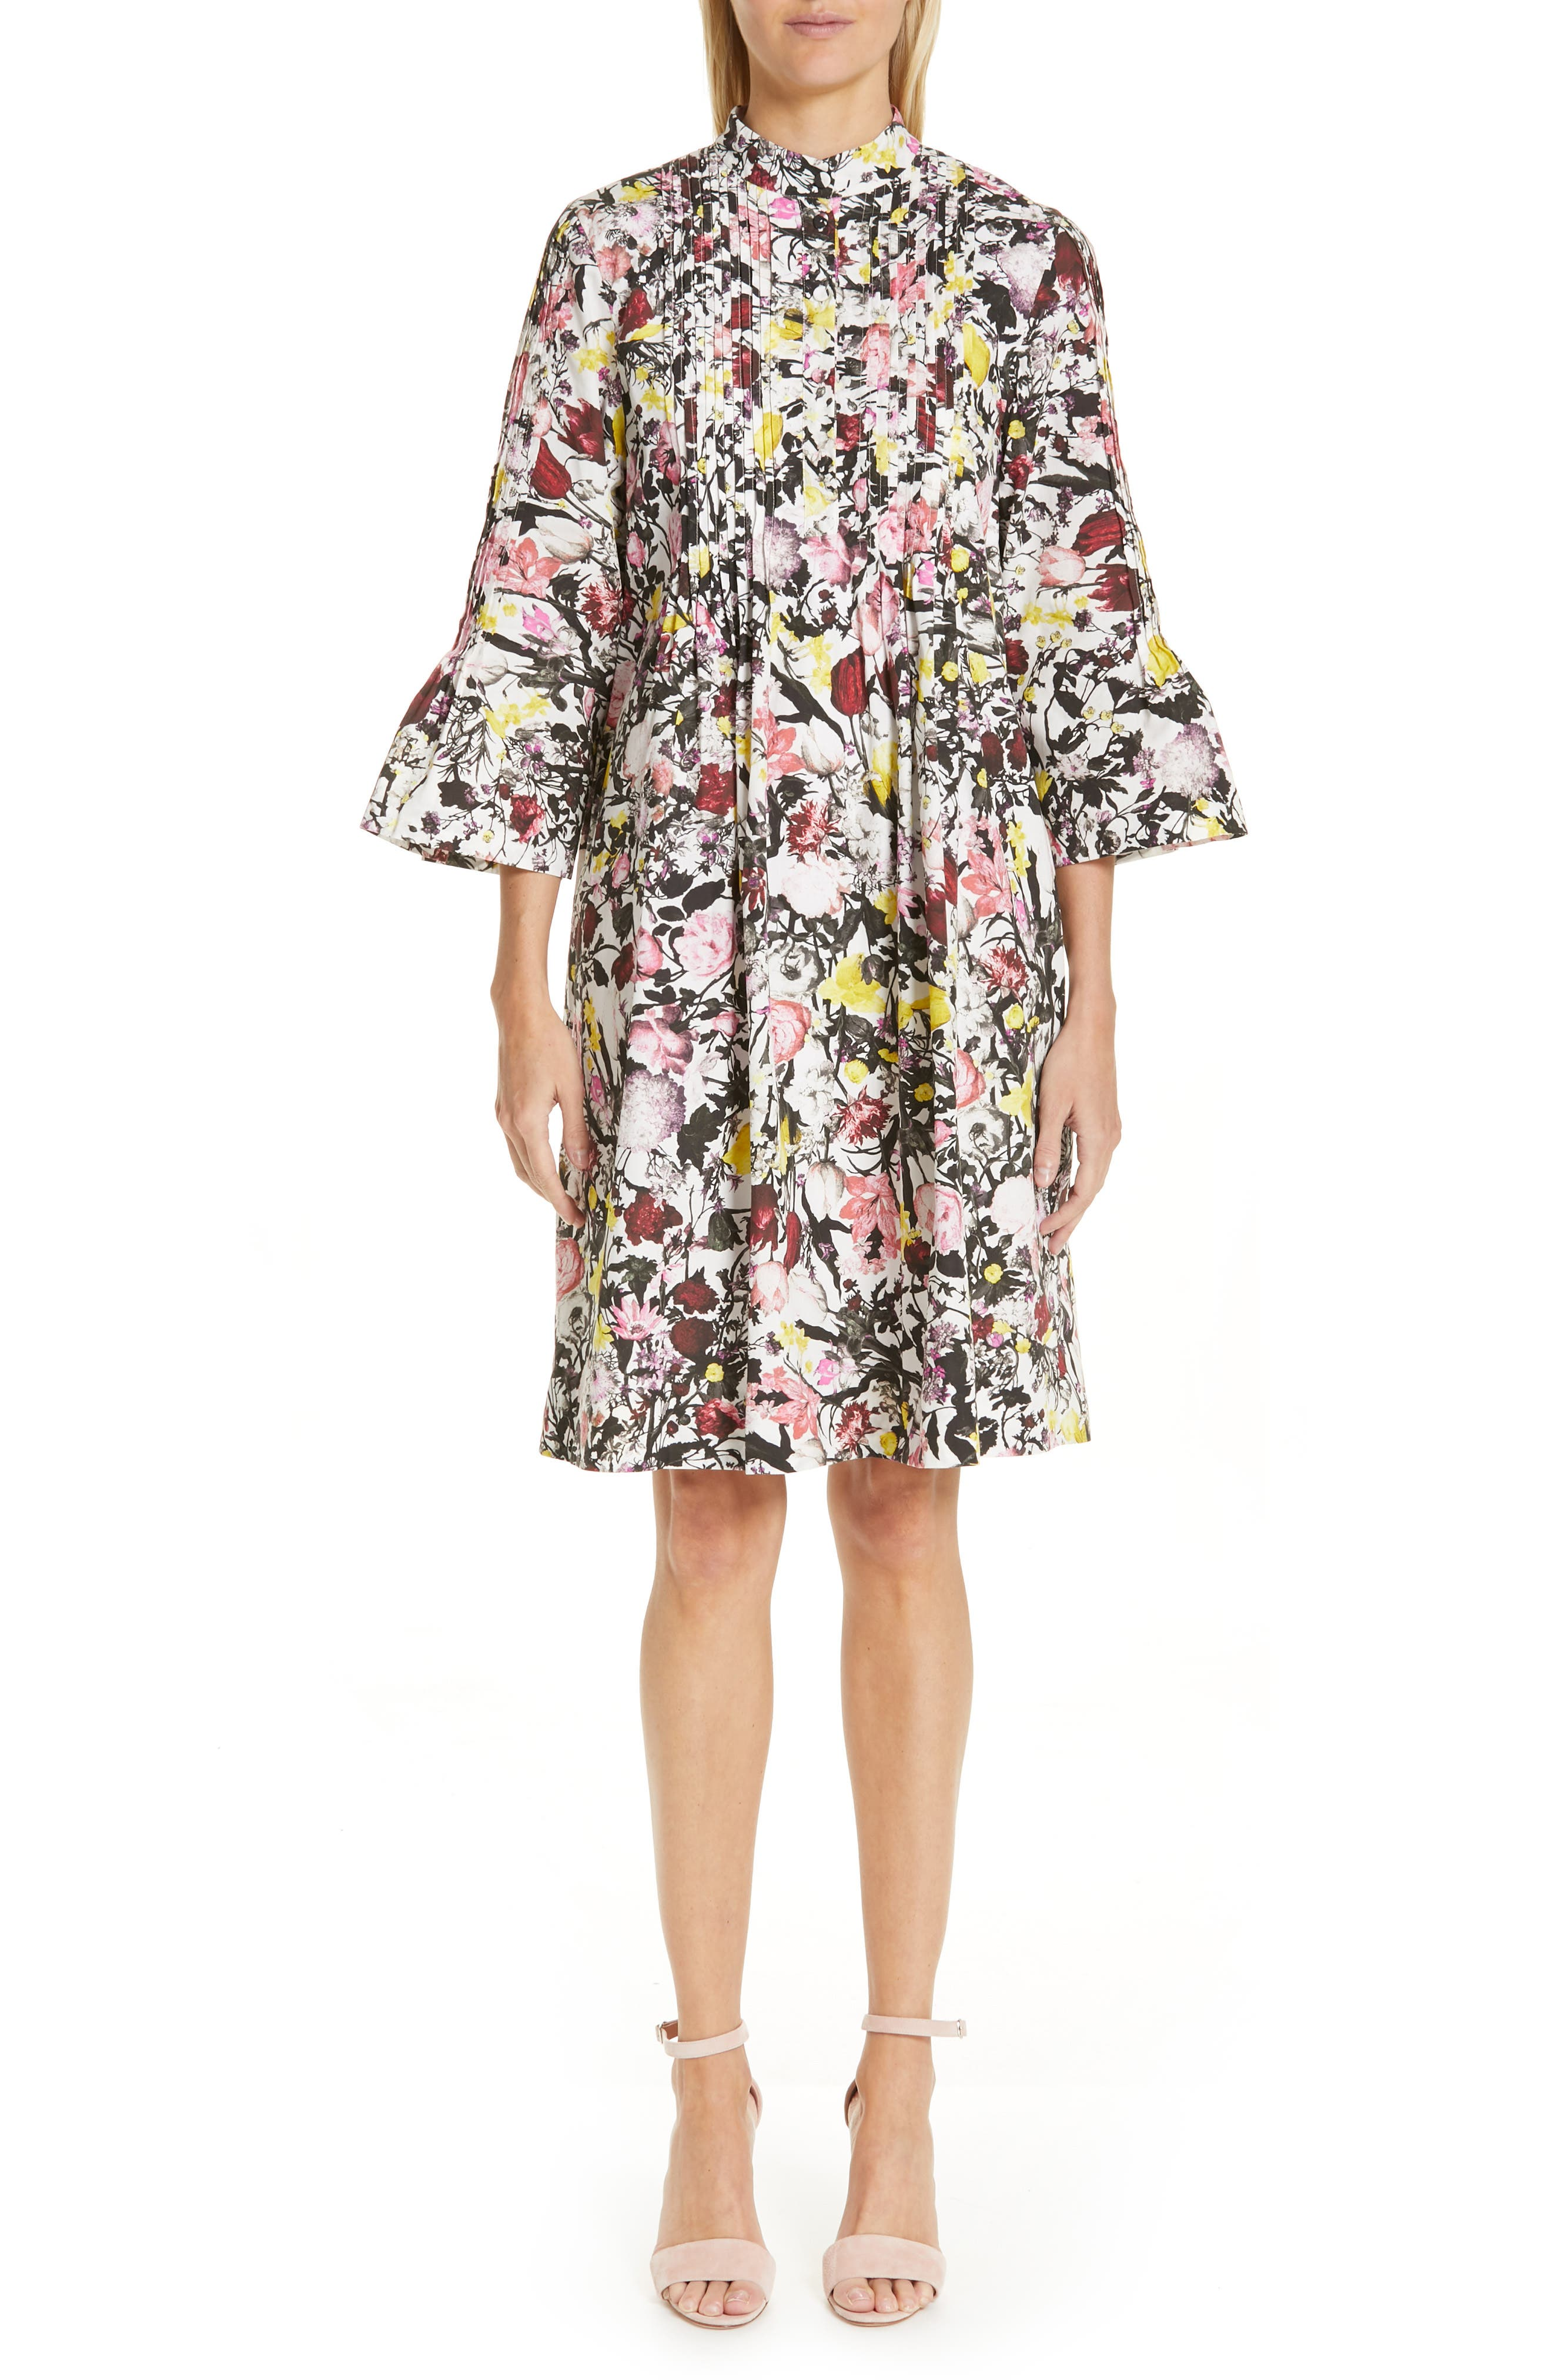 Erdem Pop Floral Print Cotton Dress, US / 12 UK - White